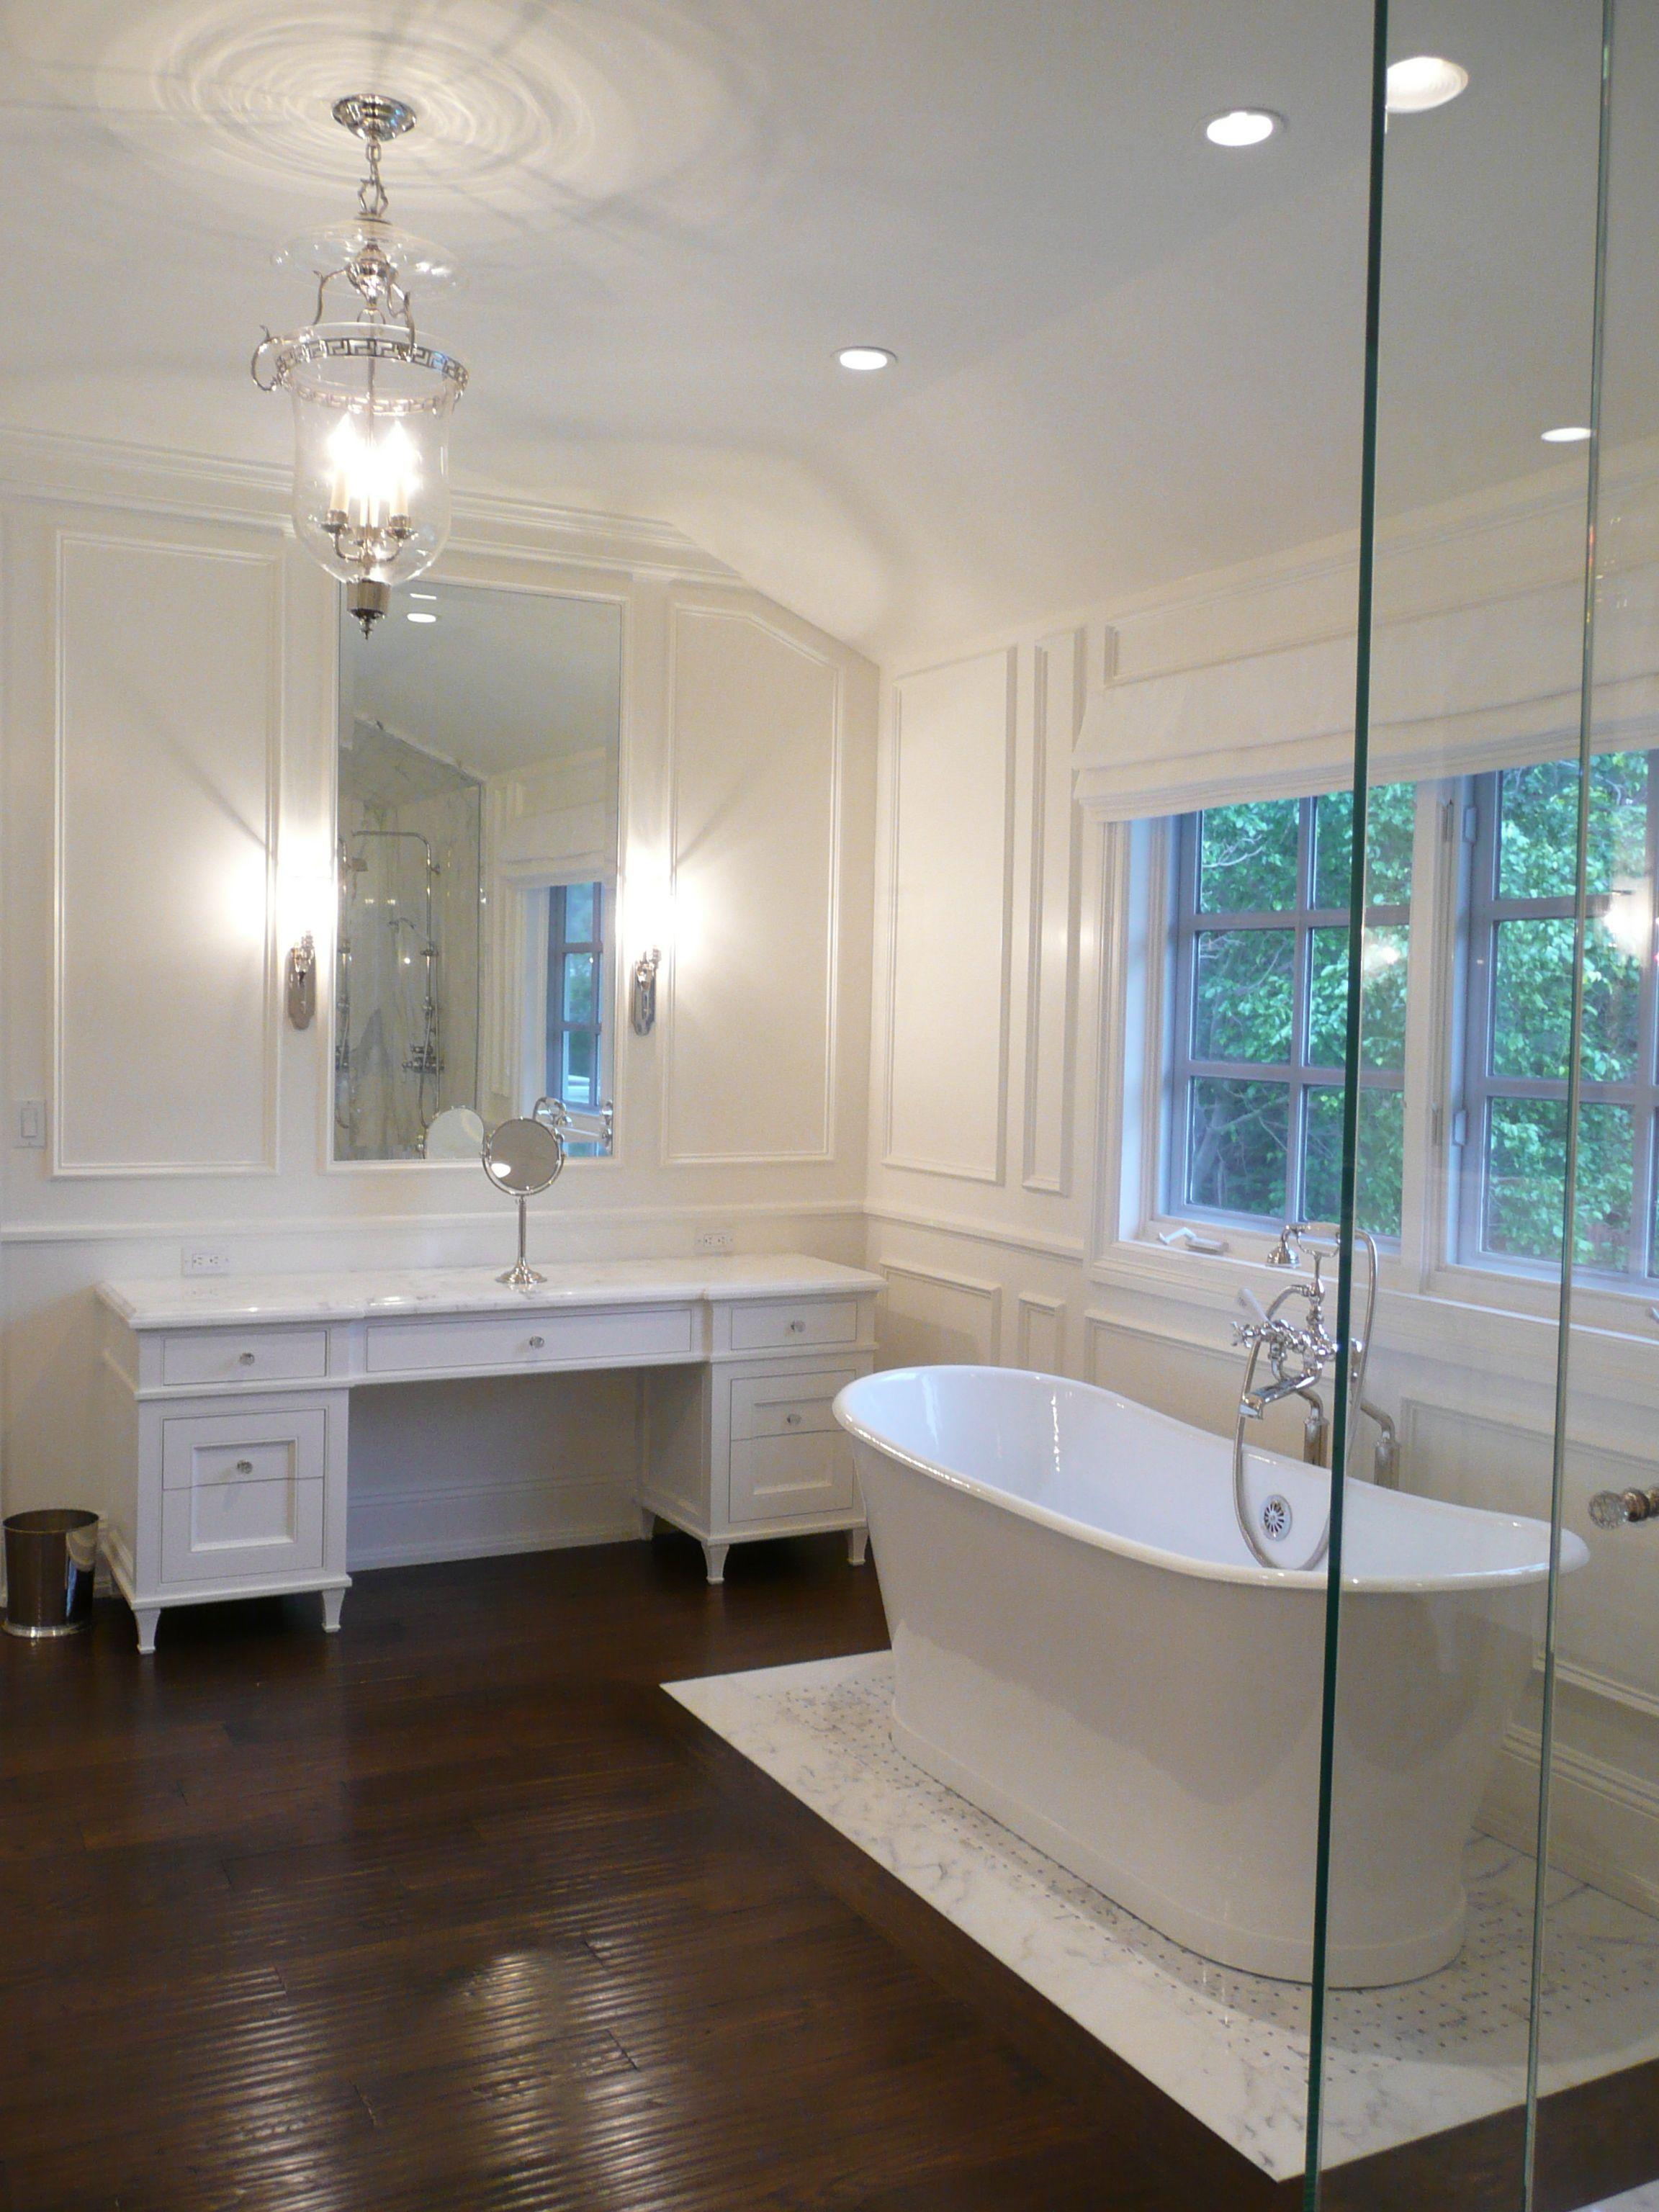 White Bathroom White On White Wall Trim Marble Floor Pad Yes